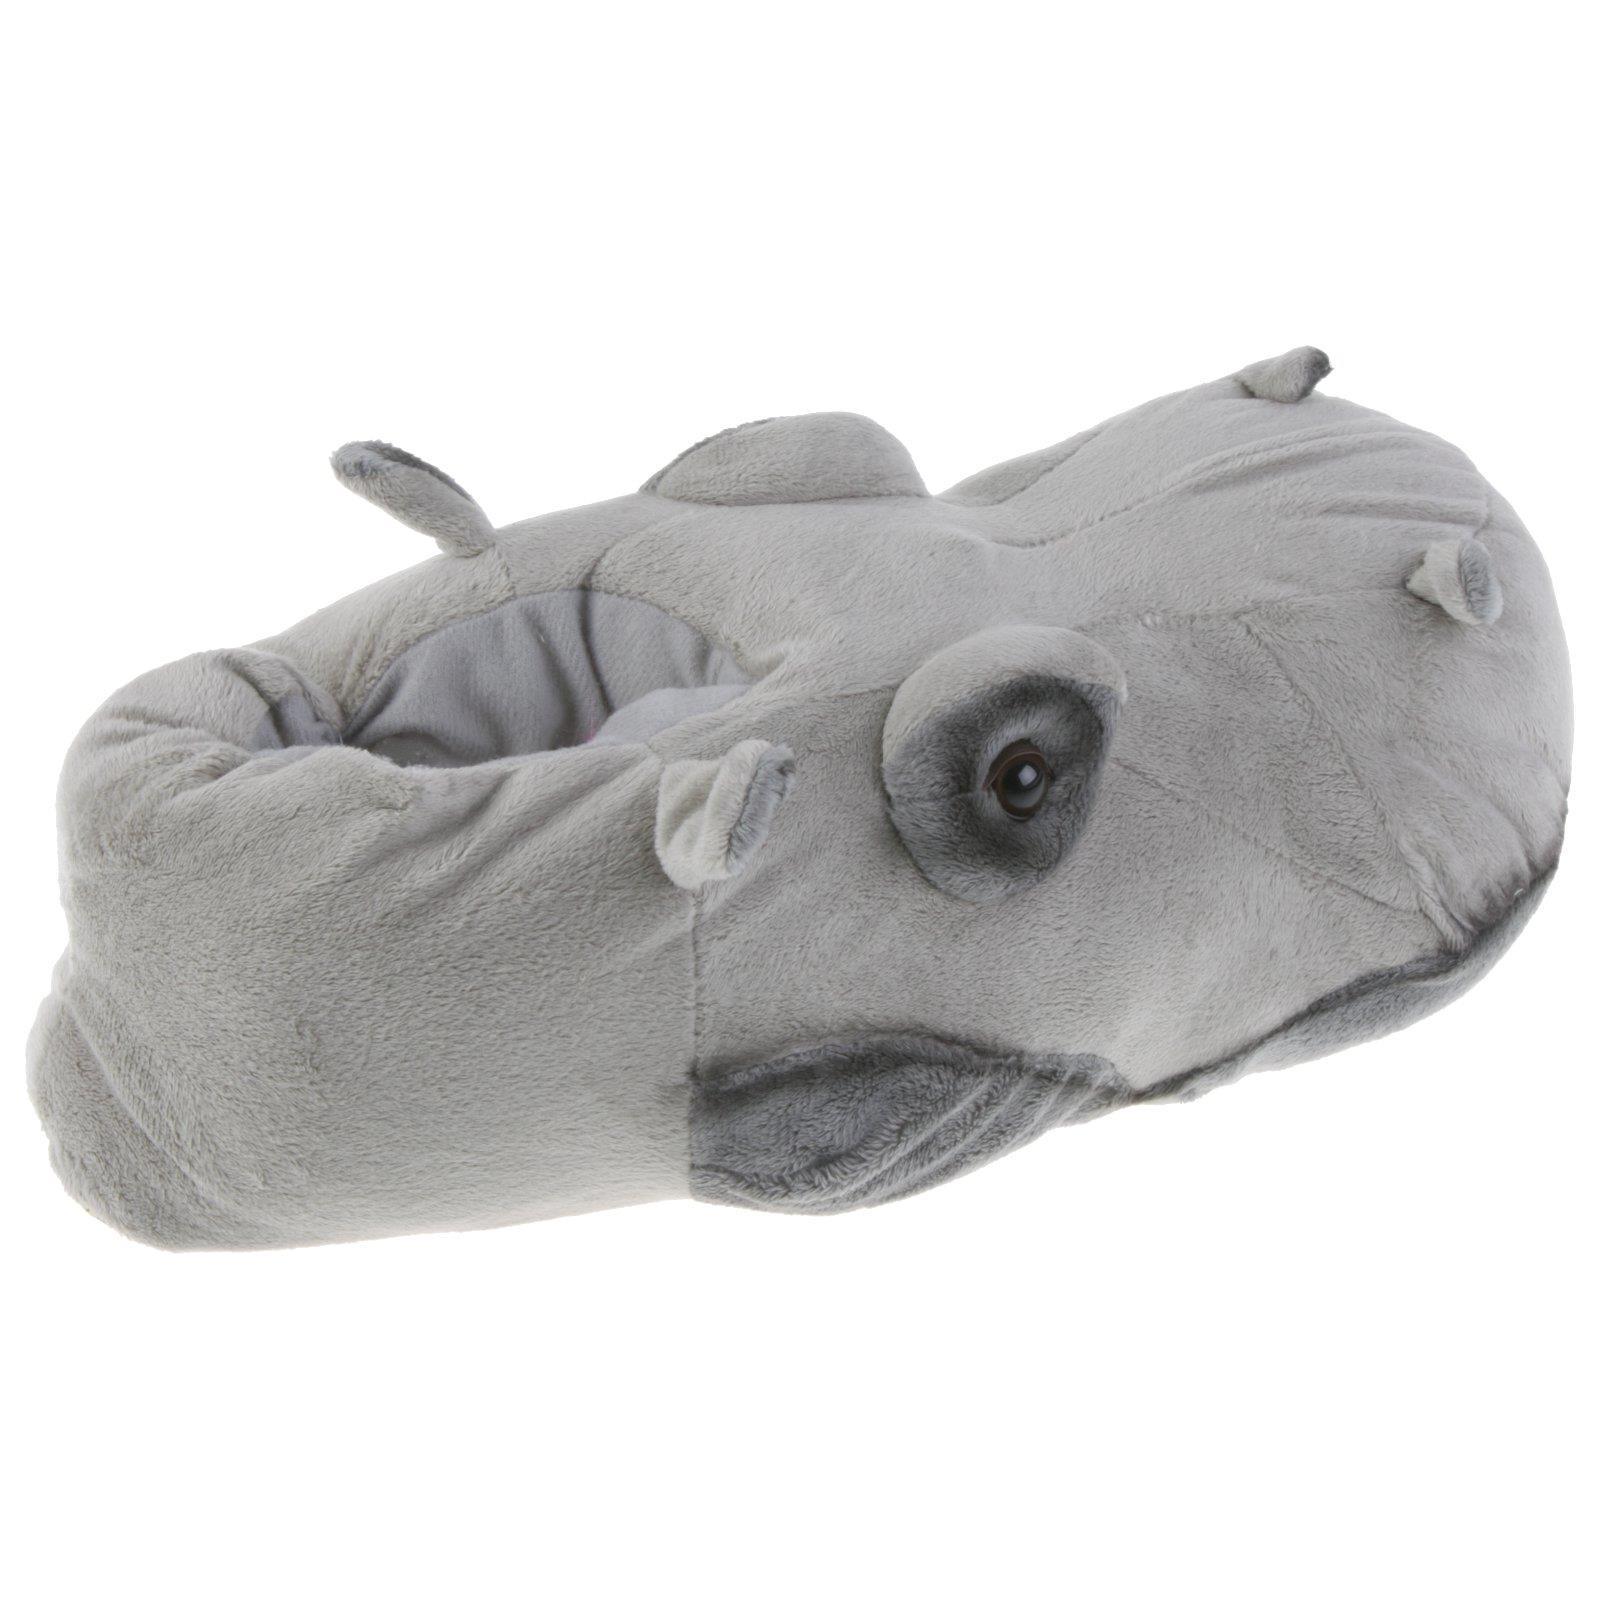 Flusspferd-Hippo-Tier-Hausschuhe-Pantoffel-Schlappen-Nilpferd-Pluesch-36-48 Indexbild 10